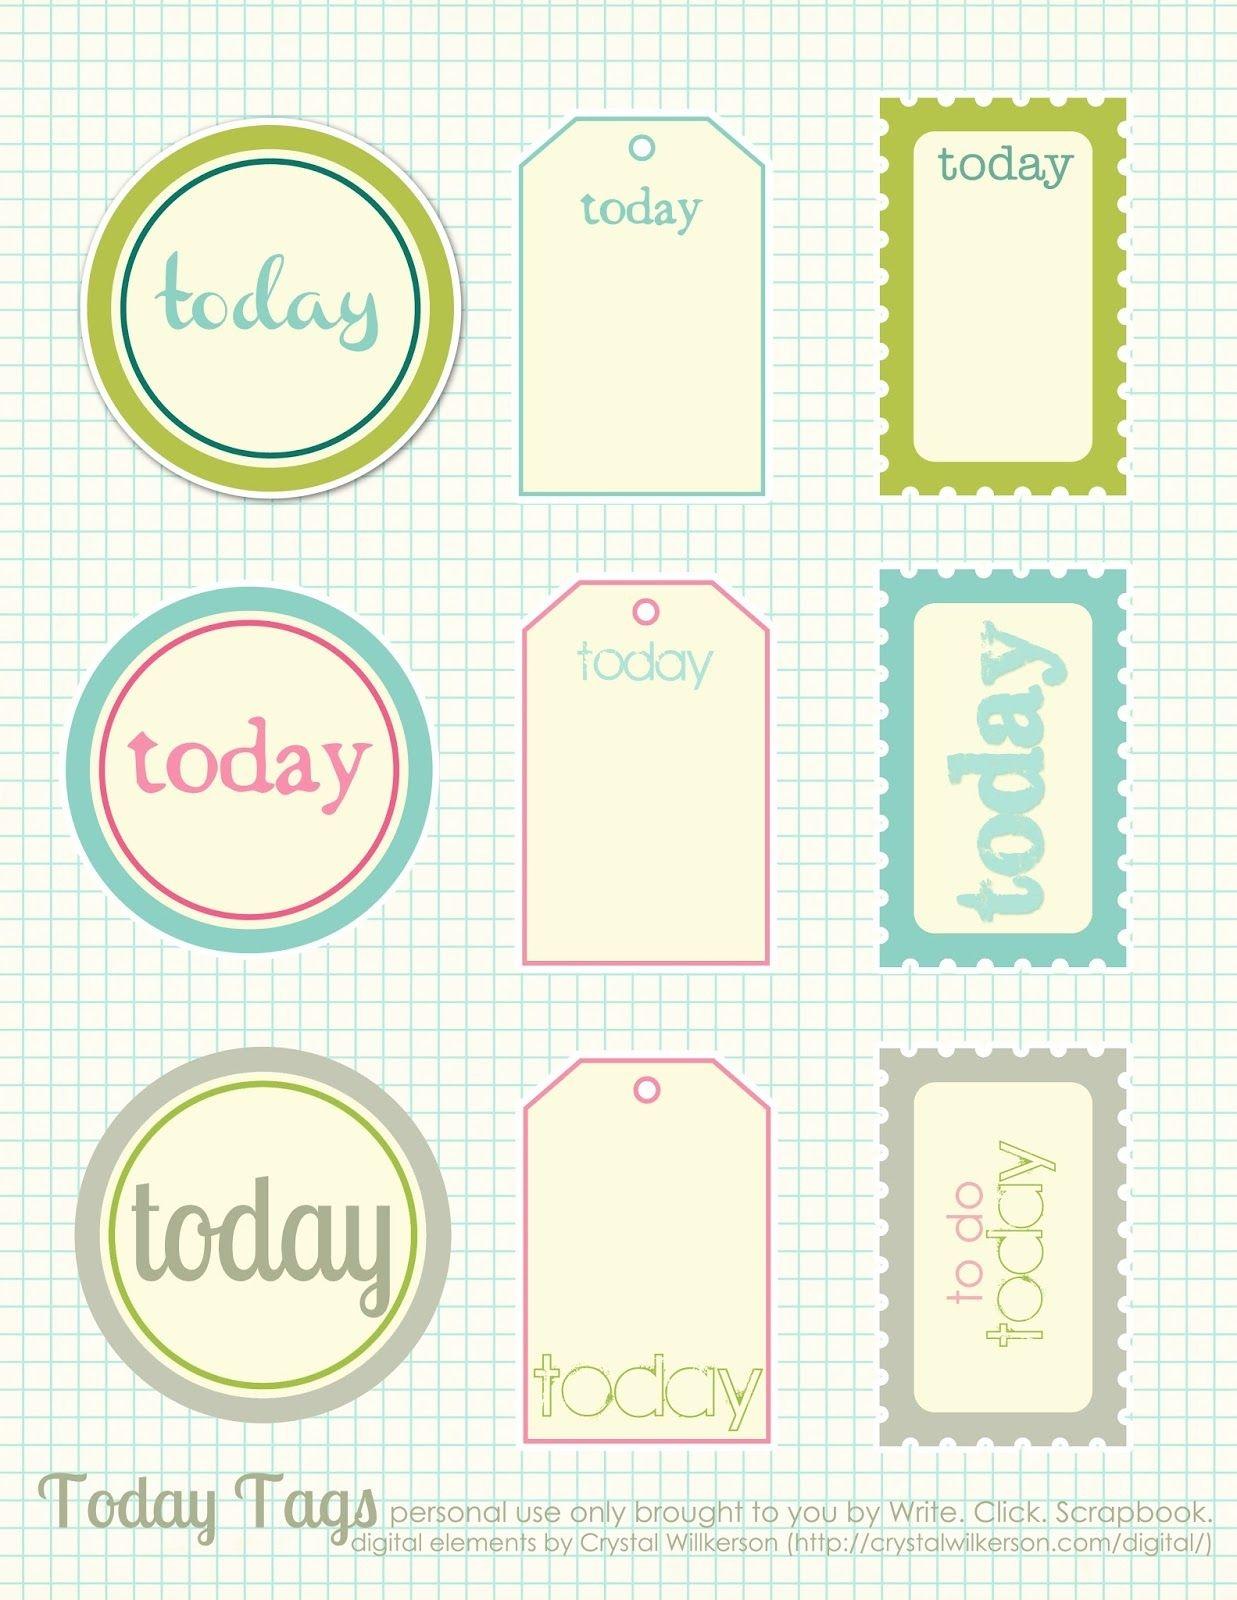 Free Printable Scrapbook Cutouts | Printable For All Topics - Free Printable Scrapbook Stuff